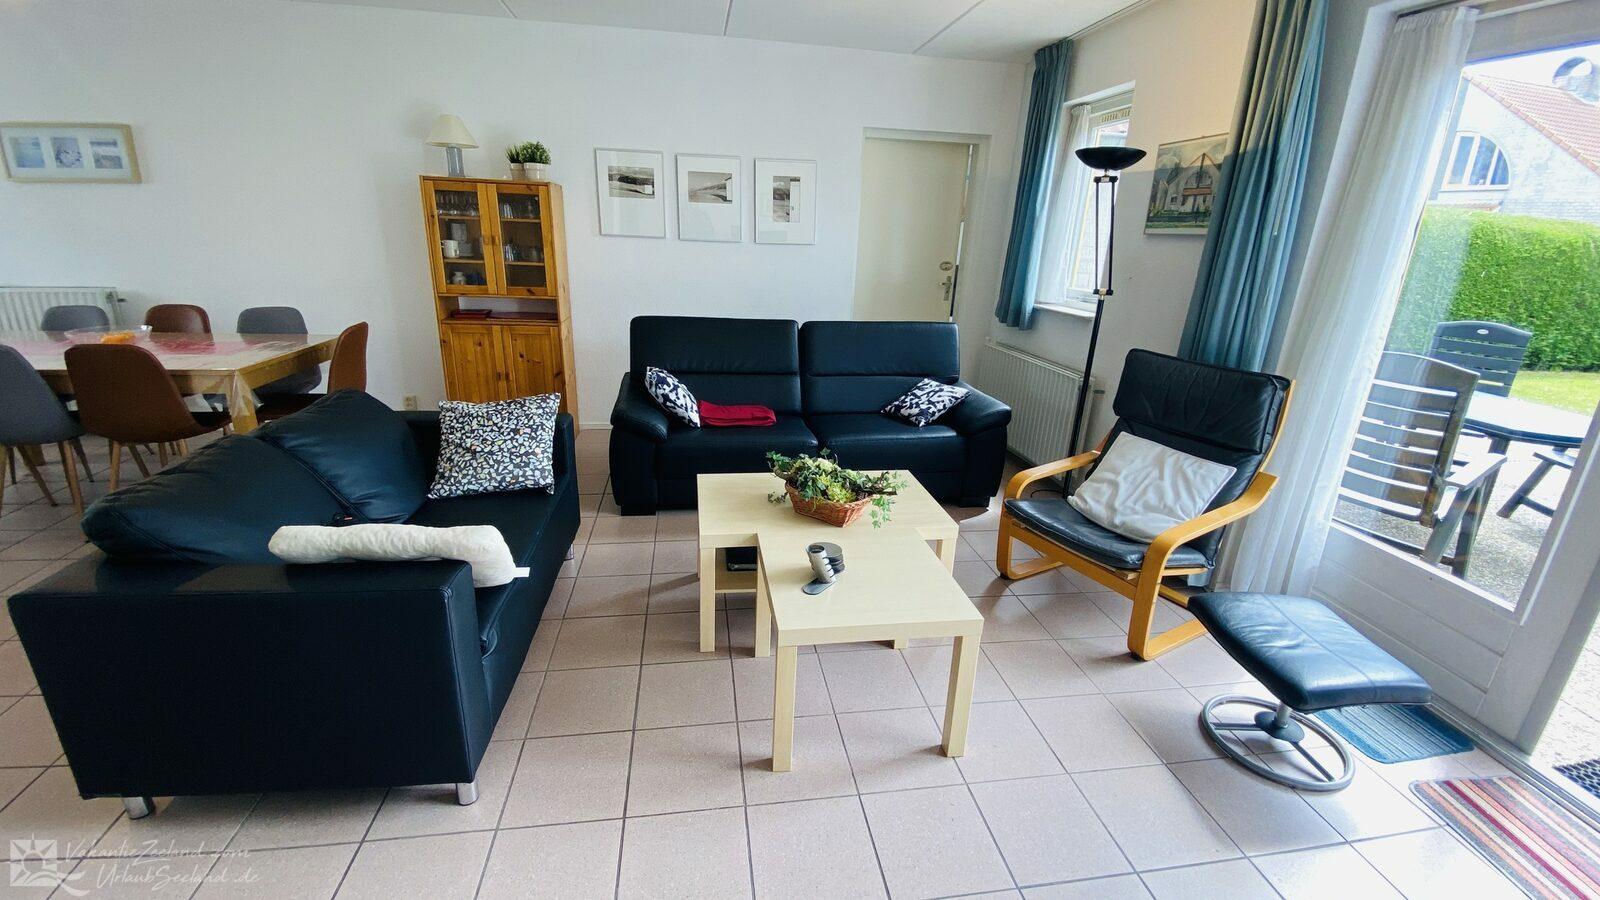 VZ407 Ferienunterkunft in Breskens